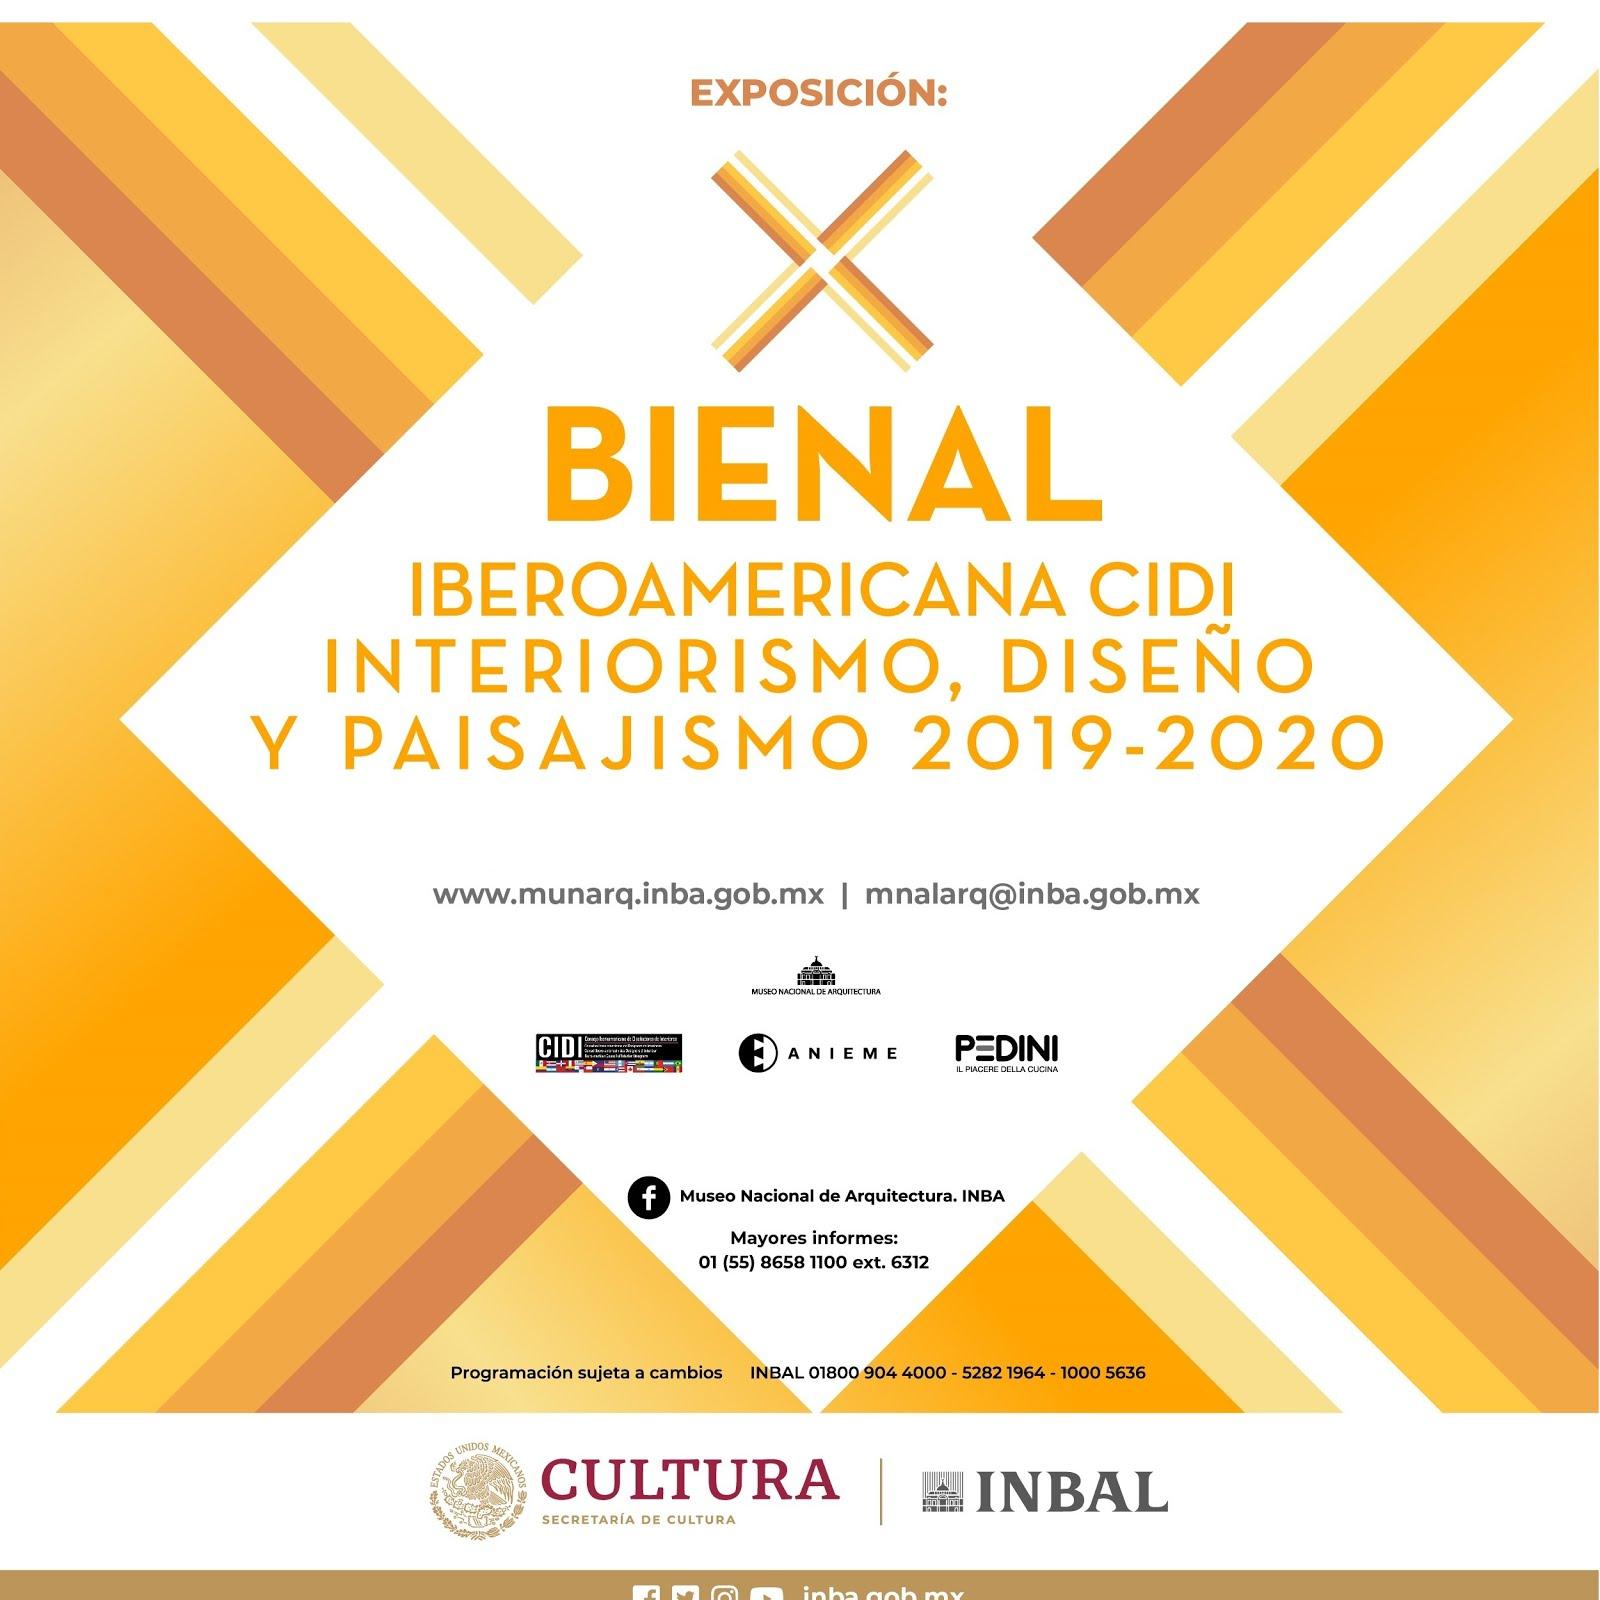 X Bienal Iberoamericana CIDI Interiorismo, Diseño & Paisajismo 2019-2020